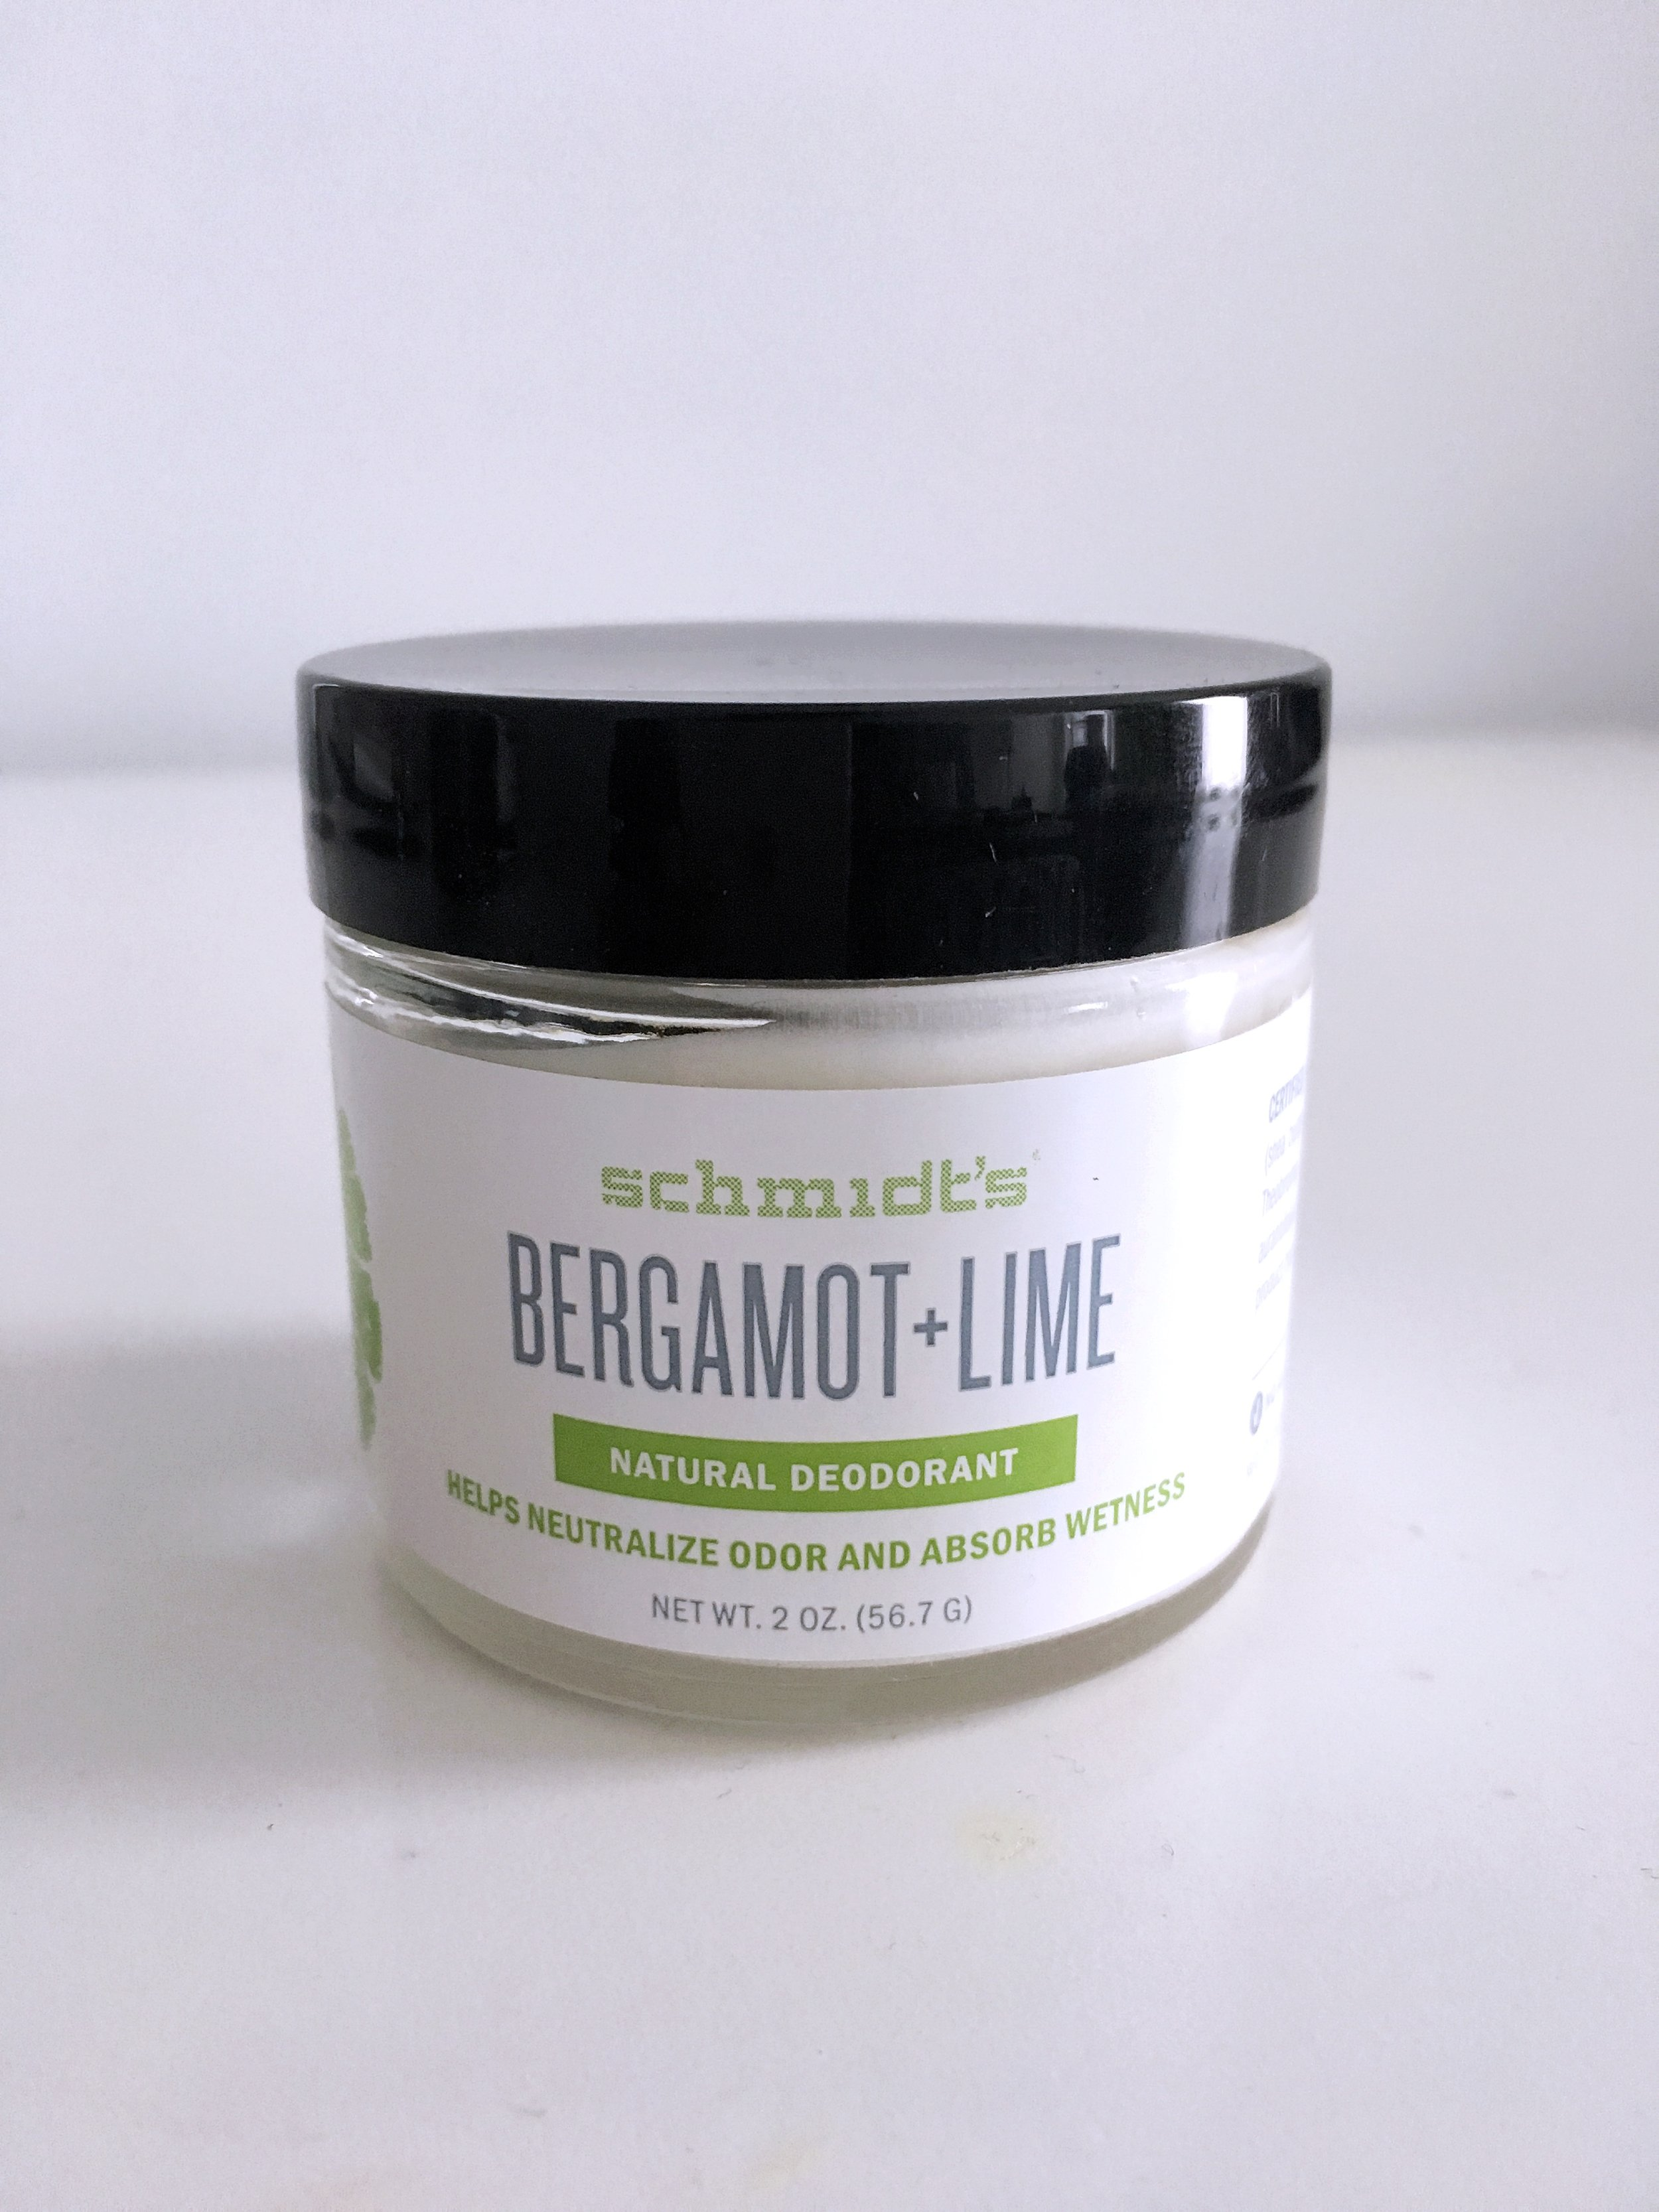 REVIEW: Schmidt's Bergamot and Lime Natural Deodorant -